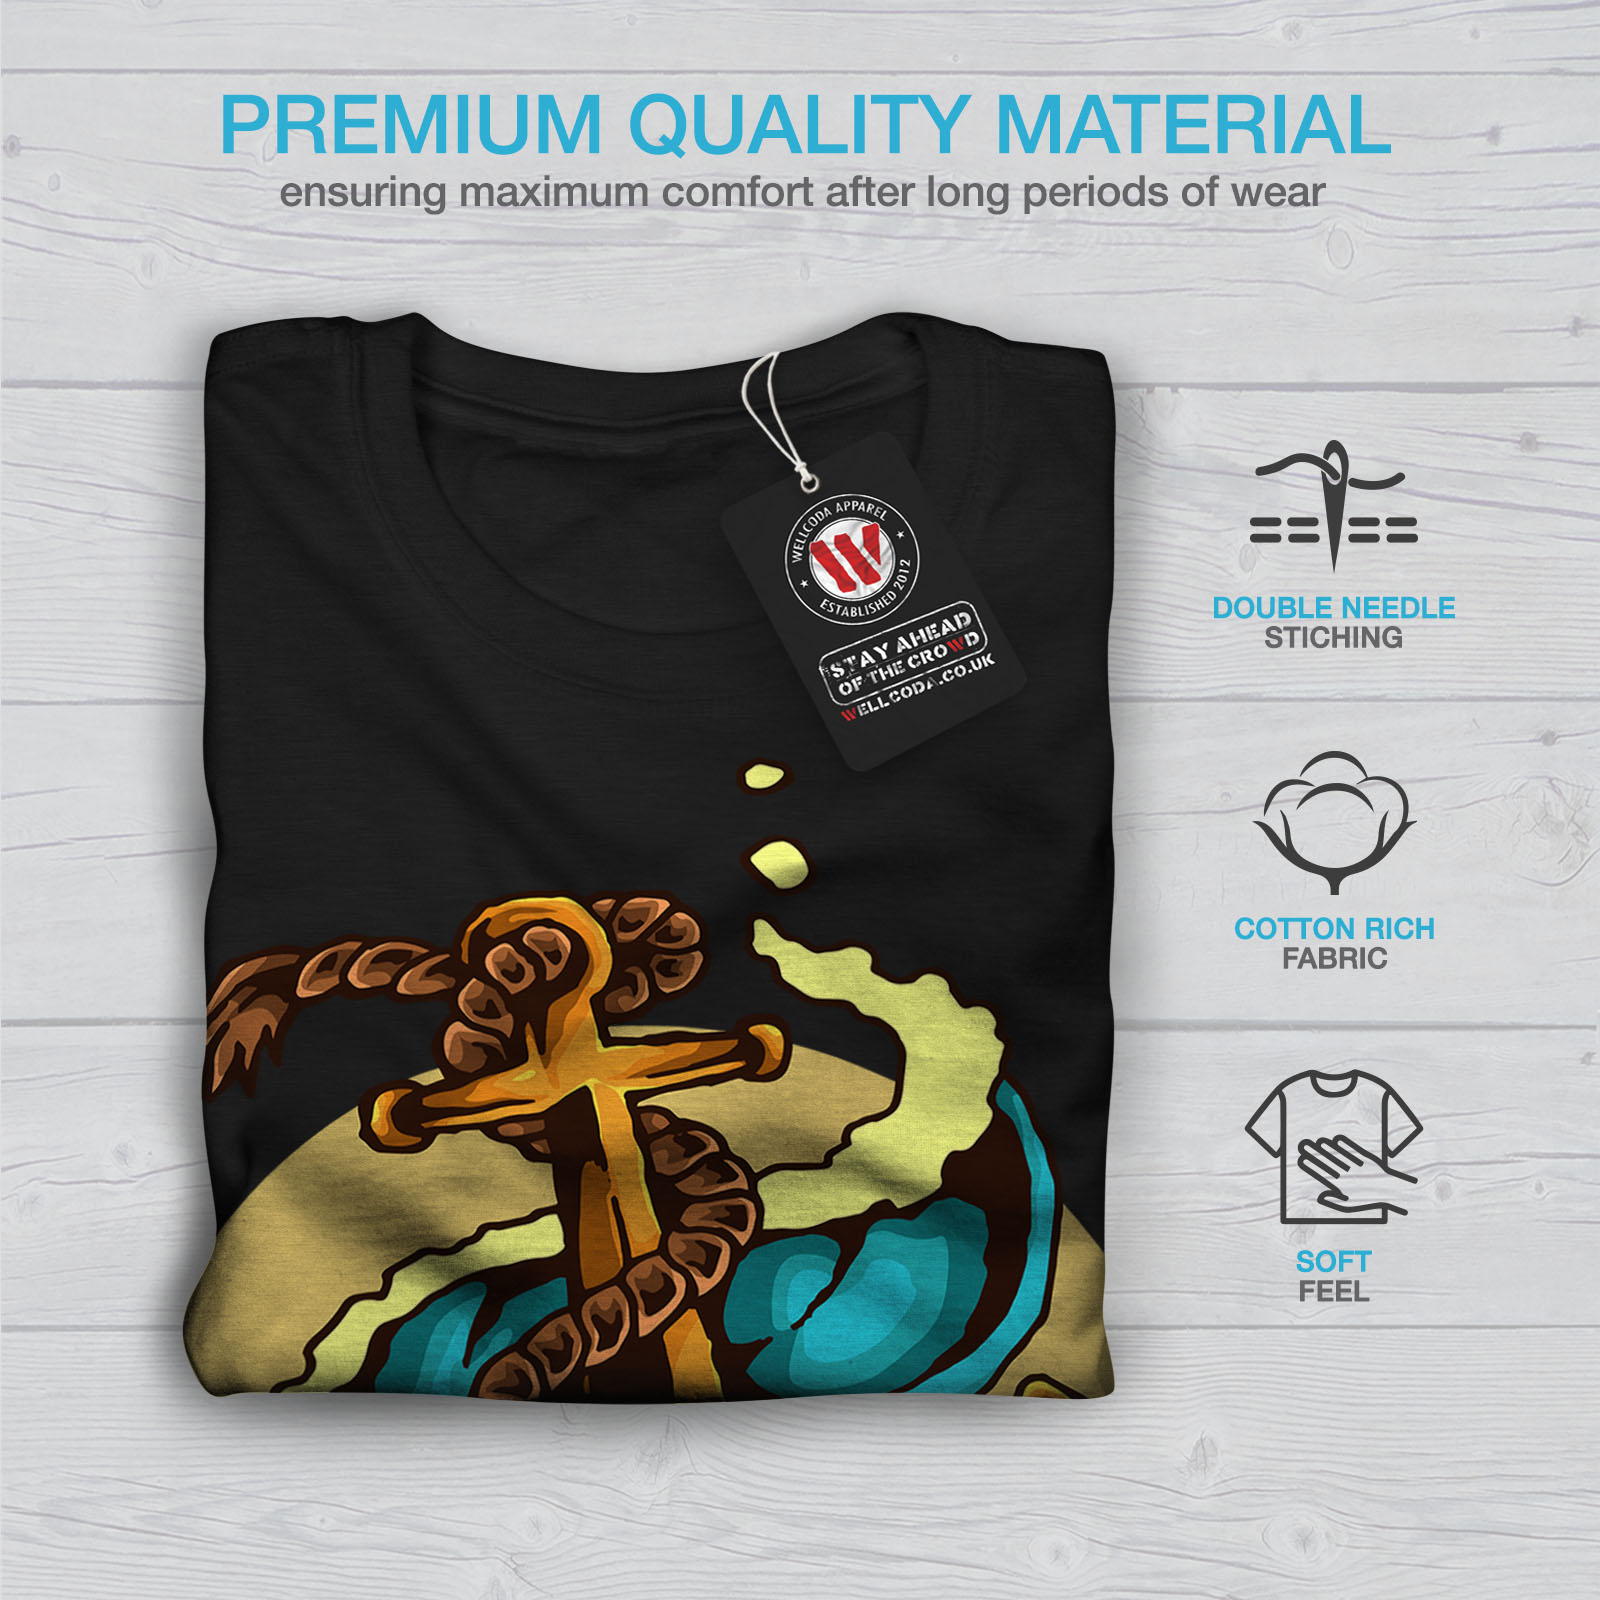 0 Graphic Design Stampato Tee Wellcoda mare marino anchor Moda Da Uomo T-shirt